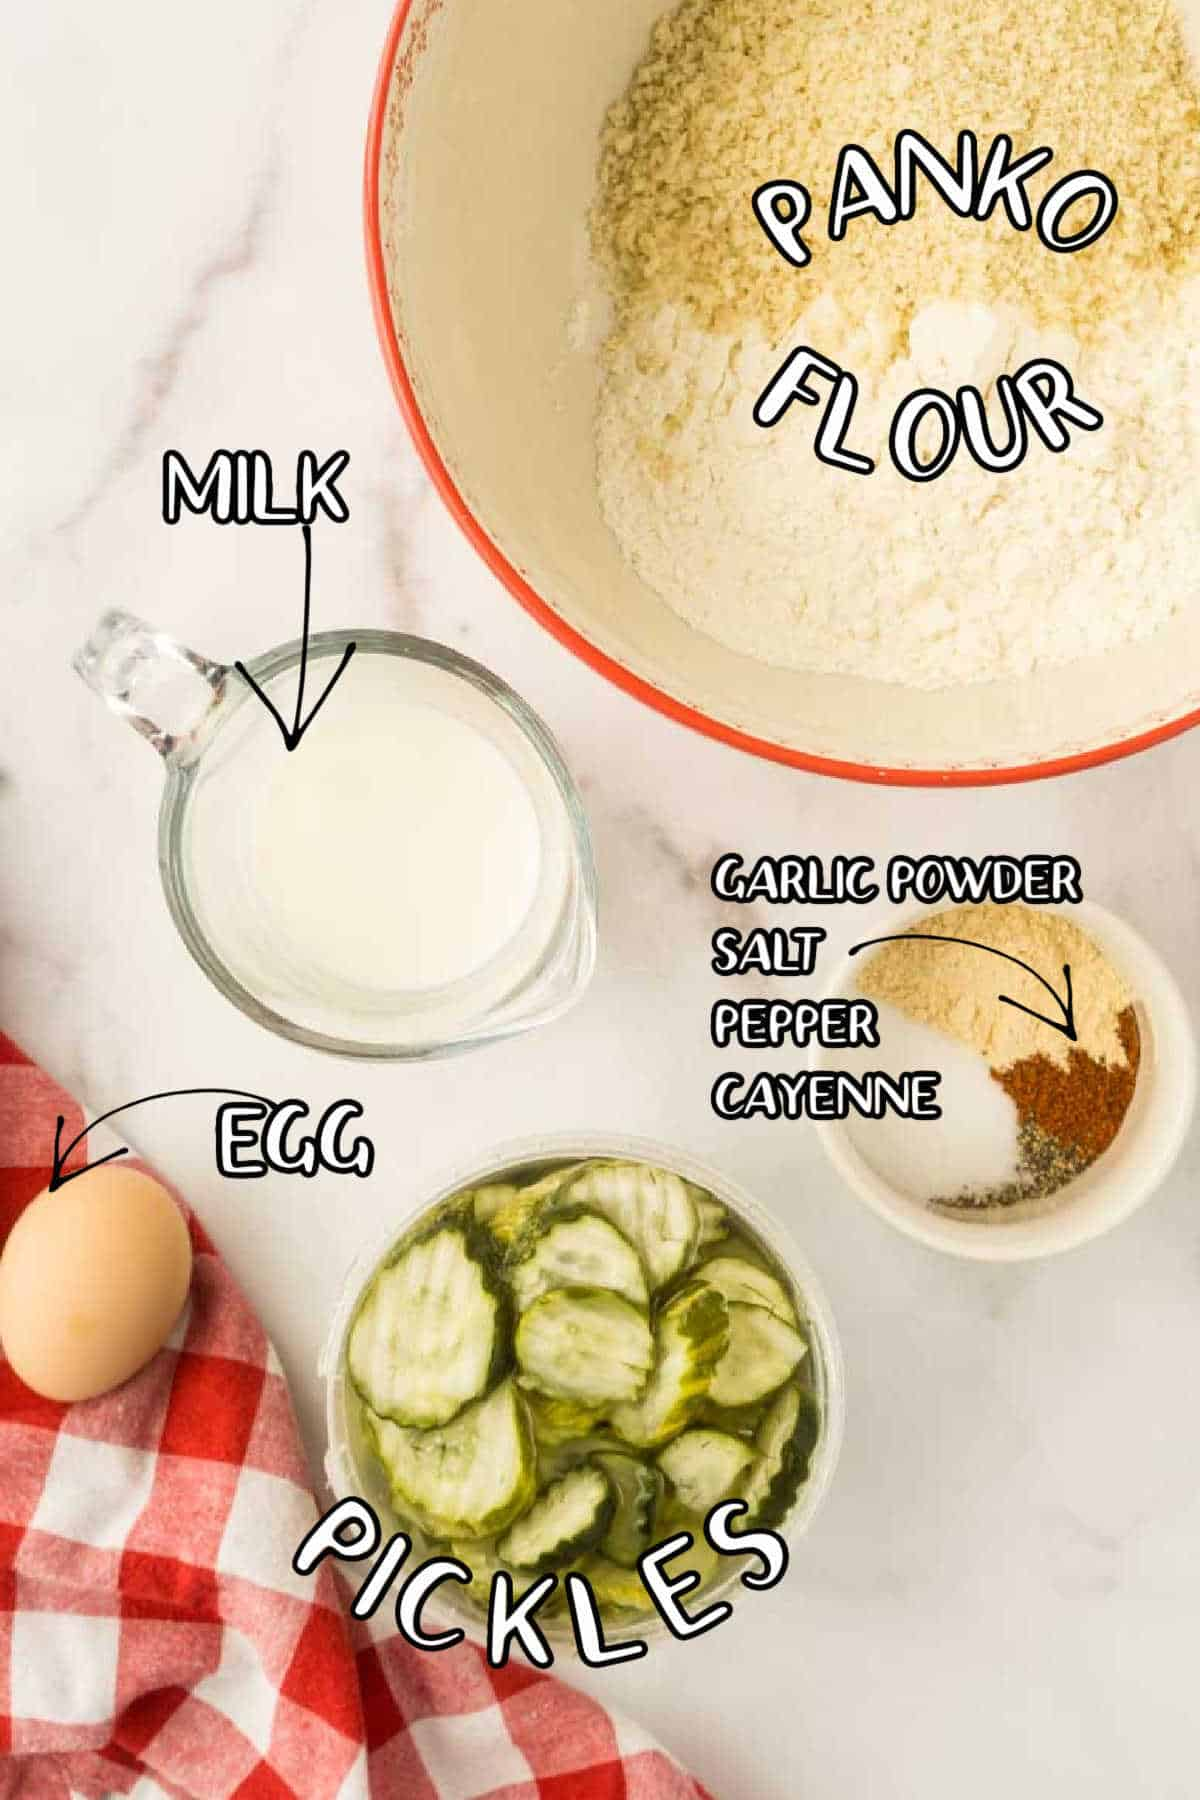 pickles, egg, milk, salt, garlic powder, pepper, flour, and bread crumbs in bowls on counter